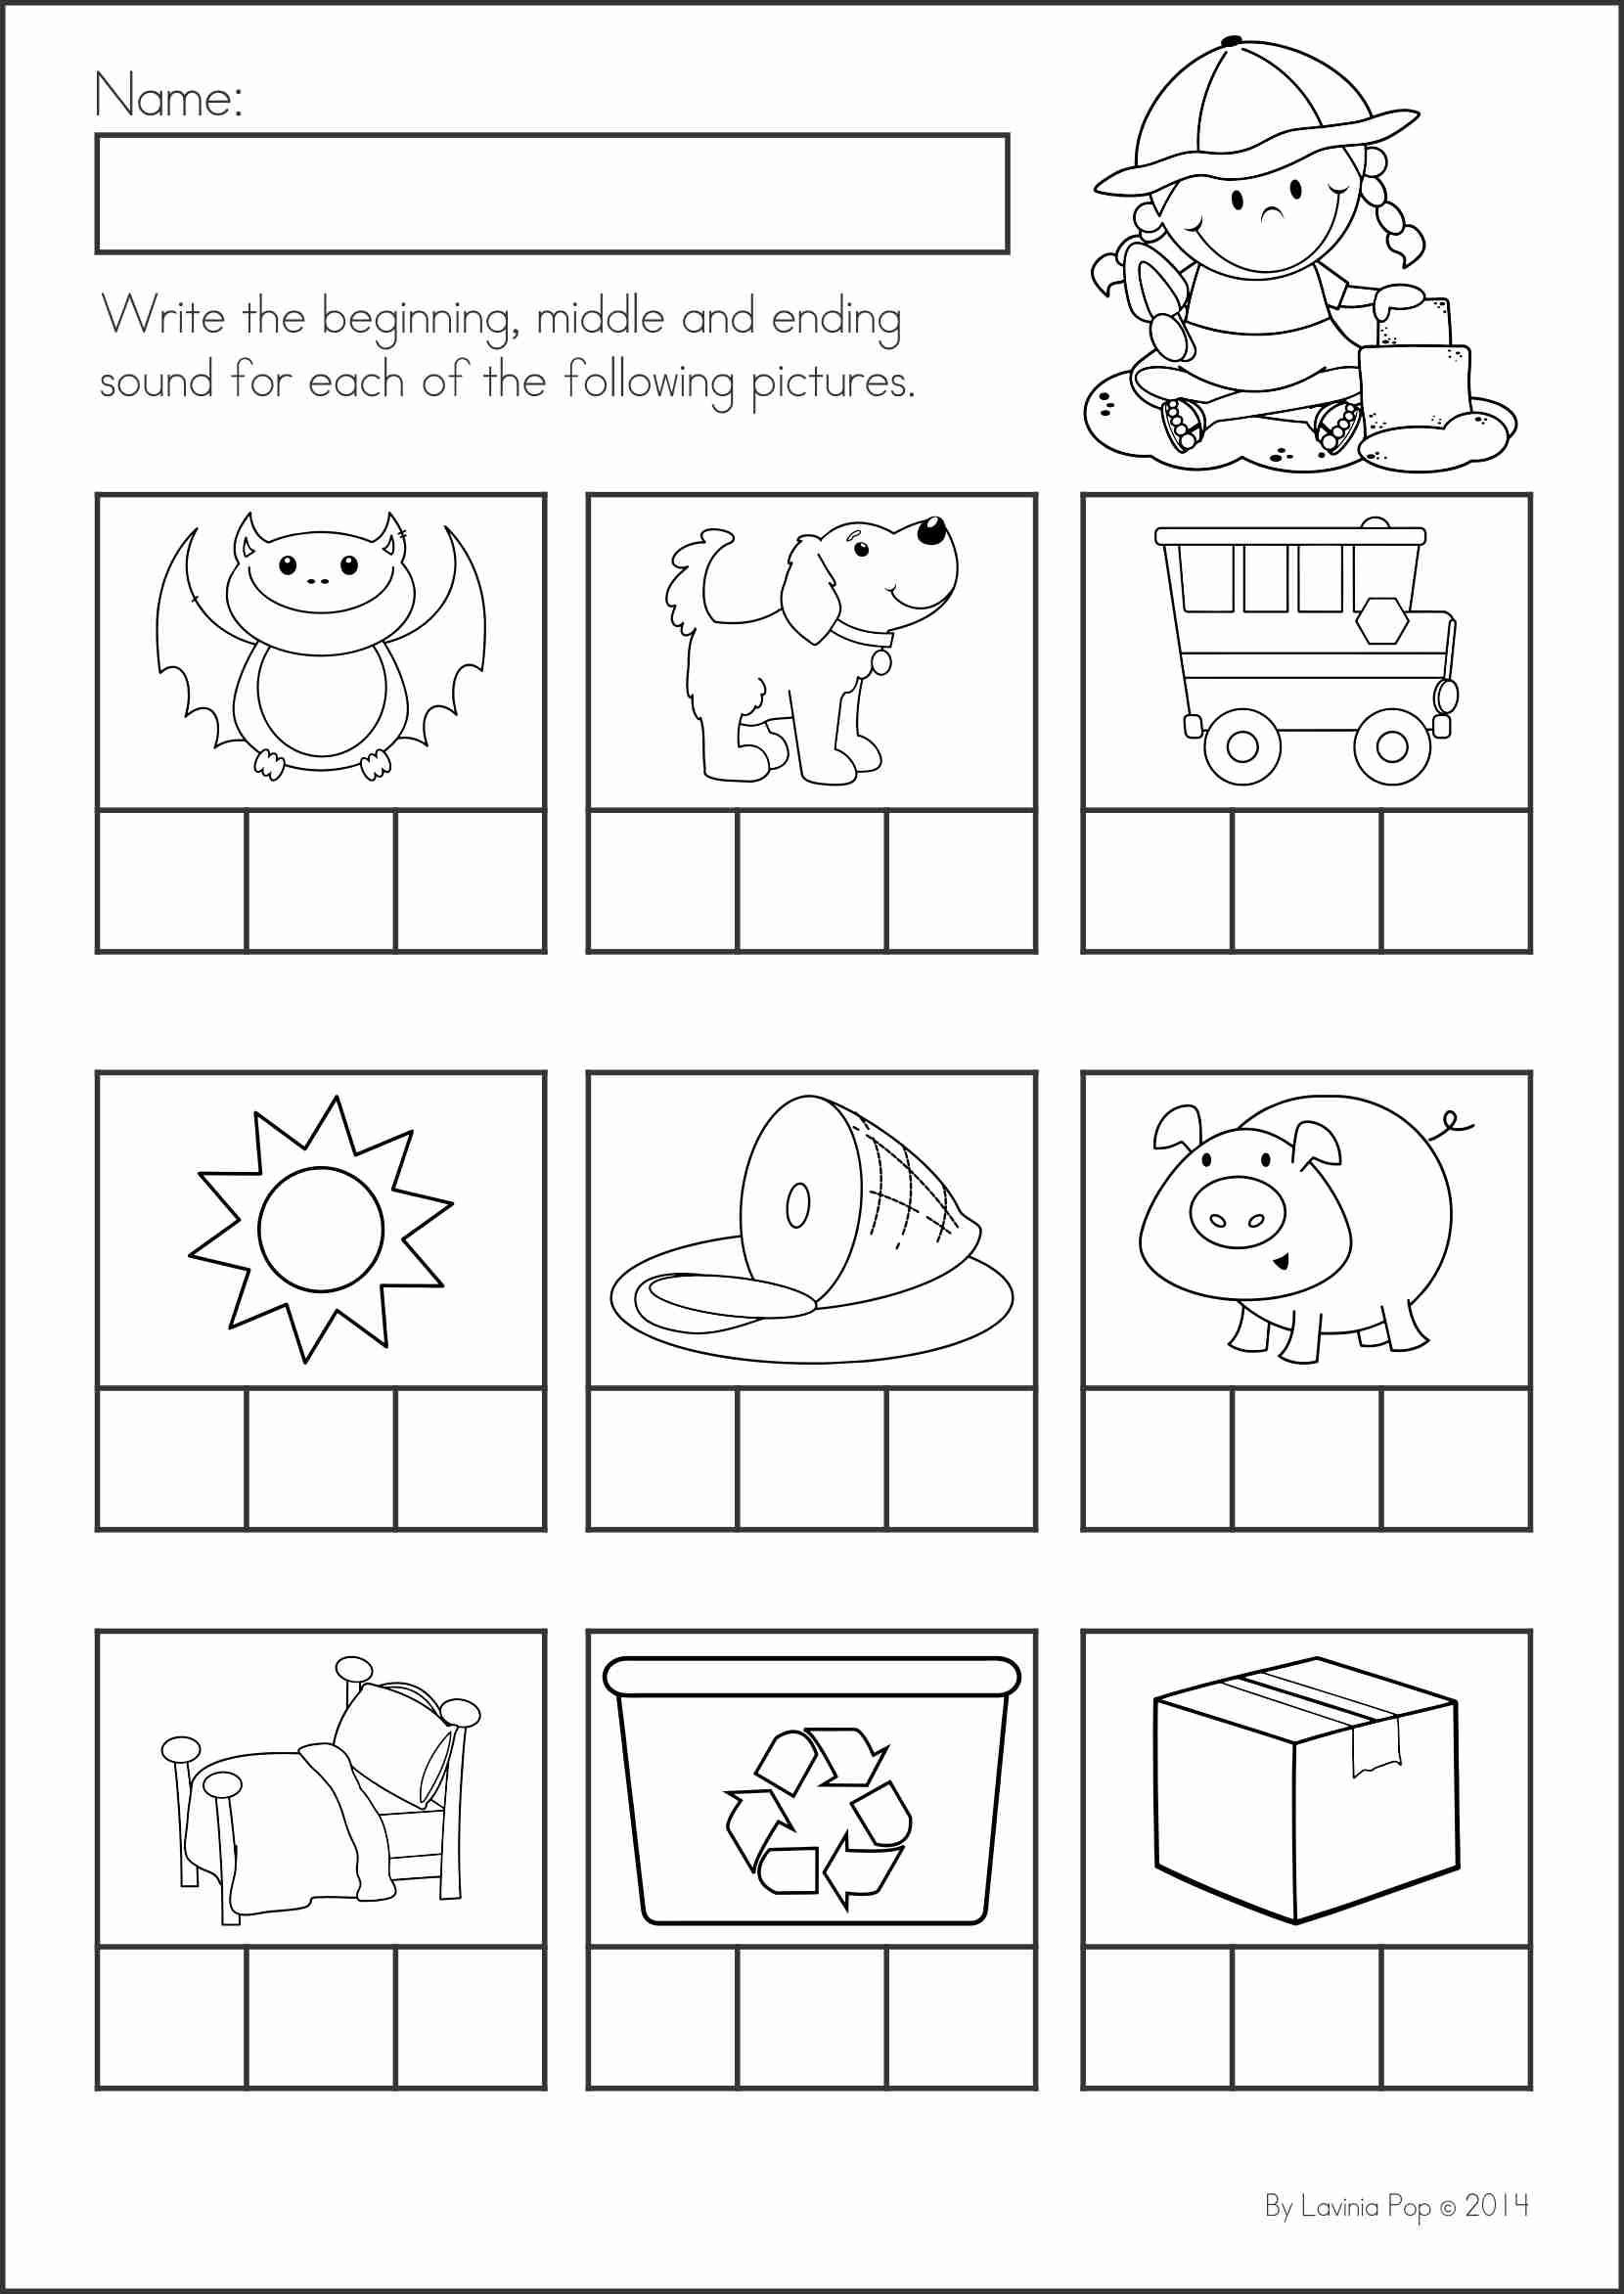 Free Printable Cvc Worksheets Unique Writing Cvc Words Worksheet